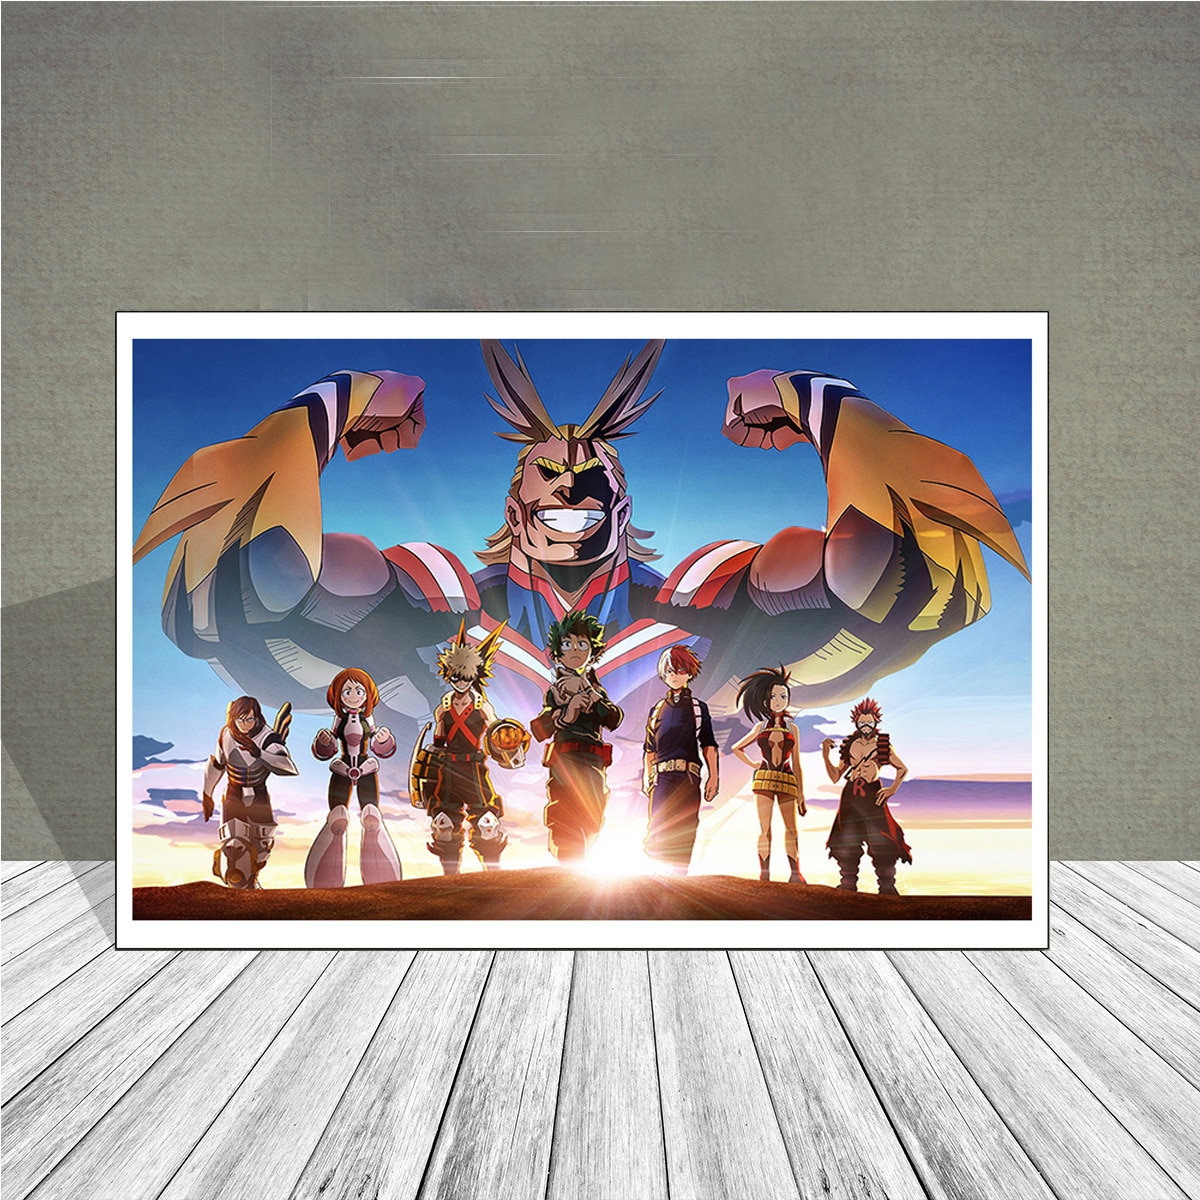 Mein Hero Wissenschaft Öl Malerei Moderne Wand ArtistsResidence Dekoration Anime Poster Japanischen Hause Decor Kinder Wand Kunst Leinwand